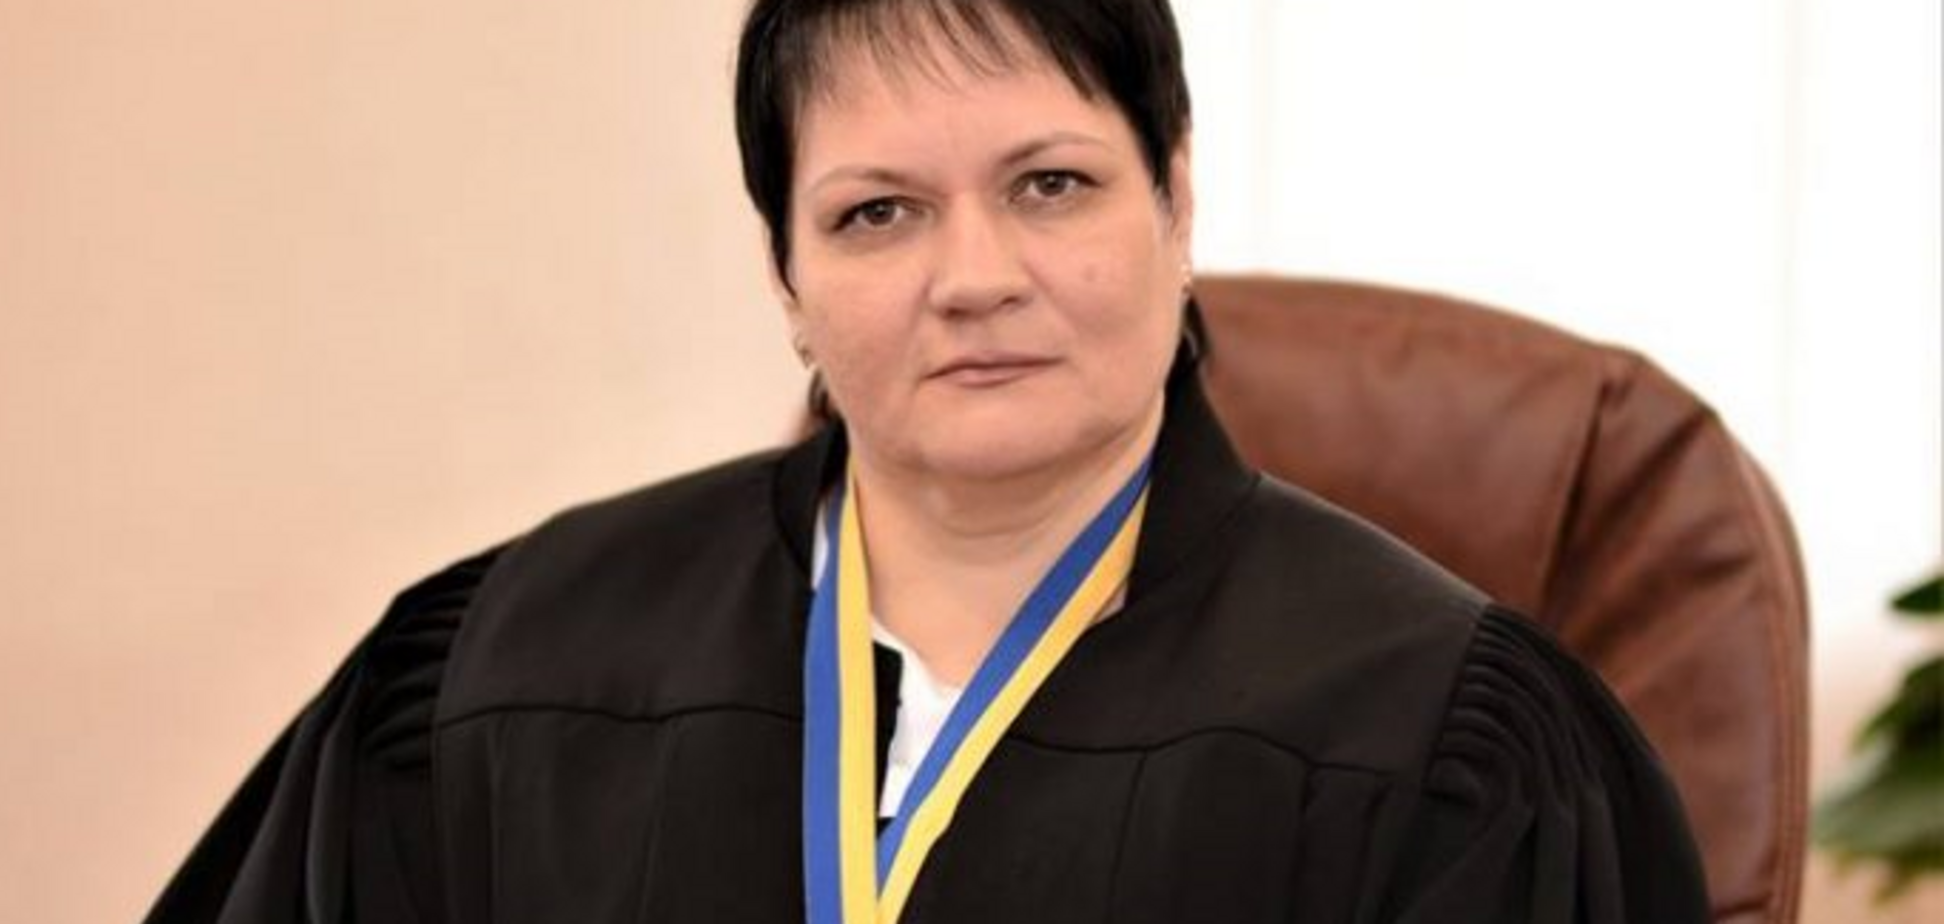 Київську суддю, яка винесла вирок генералу Назарову, хочуть покарати